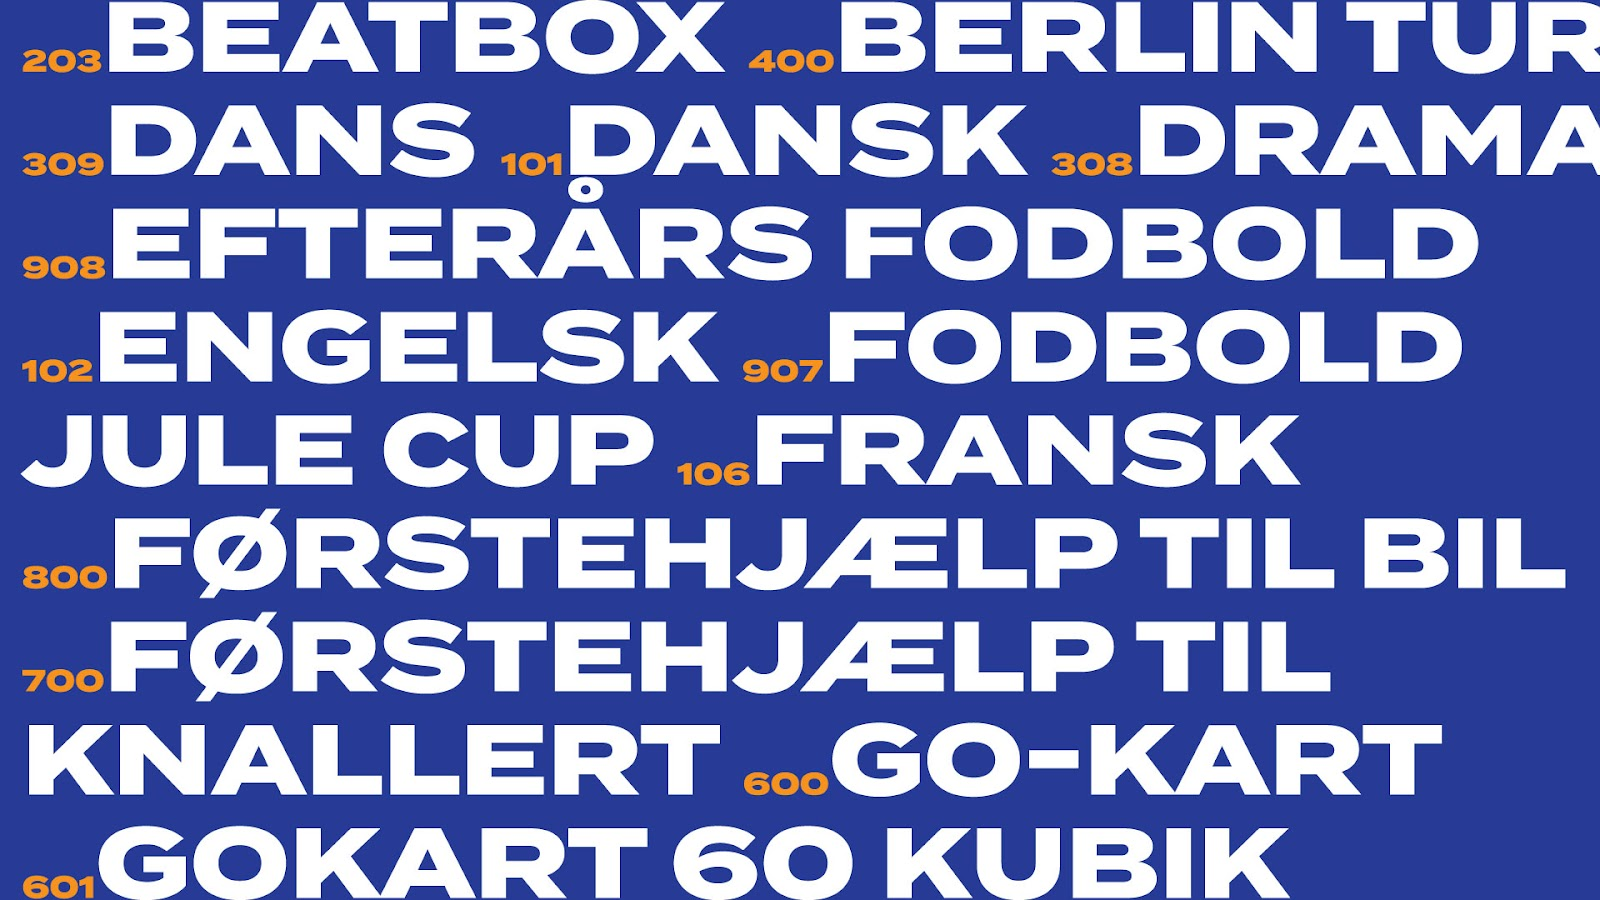 Glostrup ungdomsskole typografi